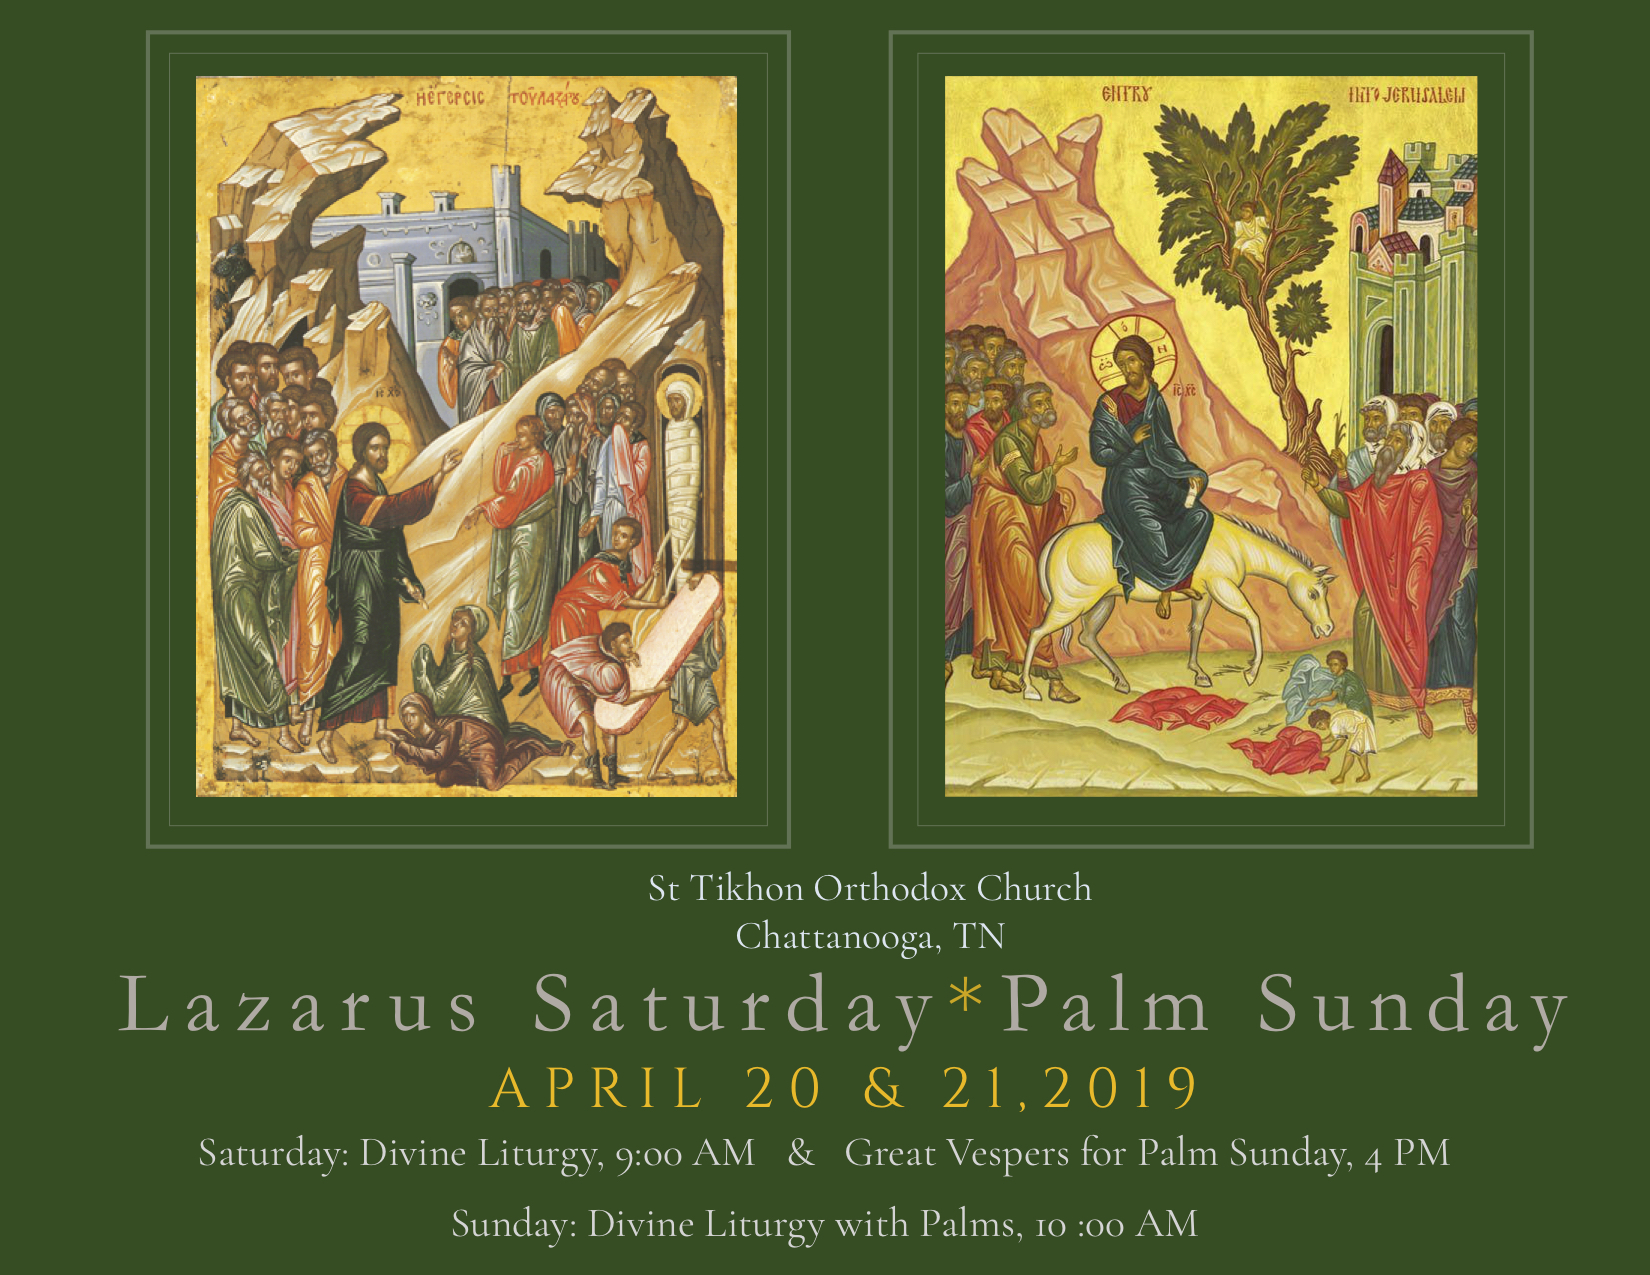 Laz Sat Palm Sunday SChedule.jpg